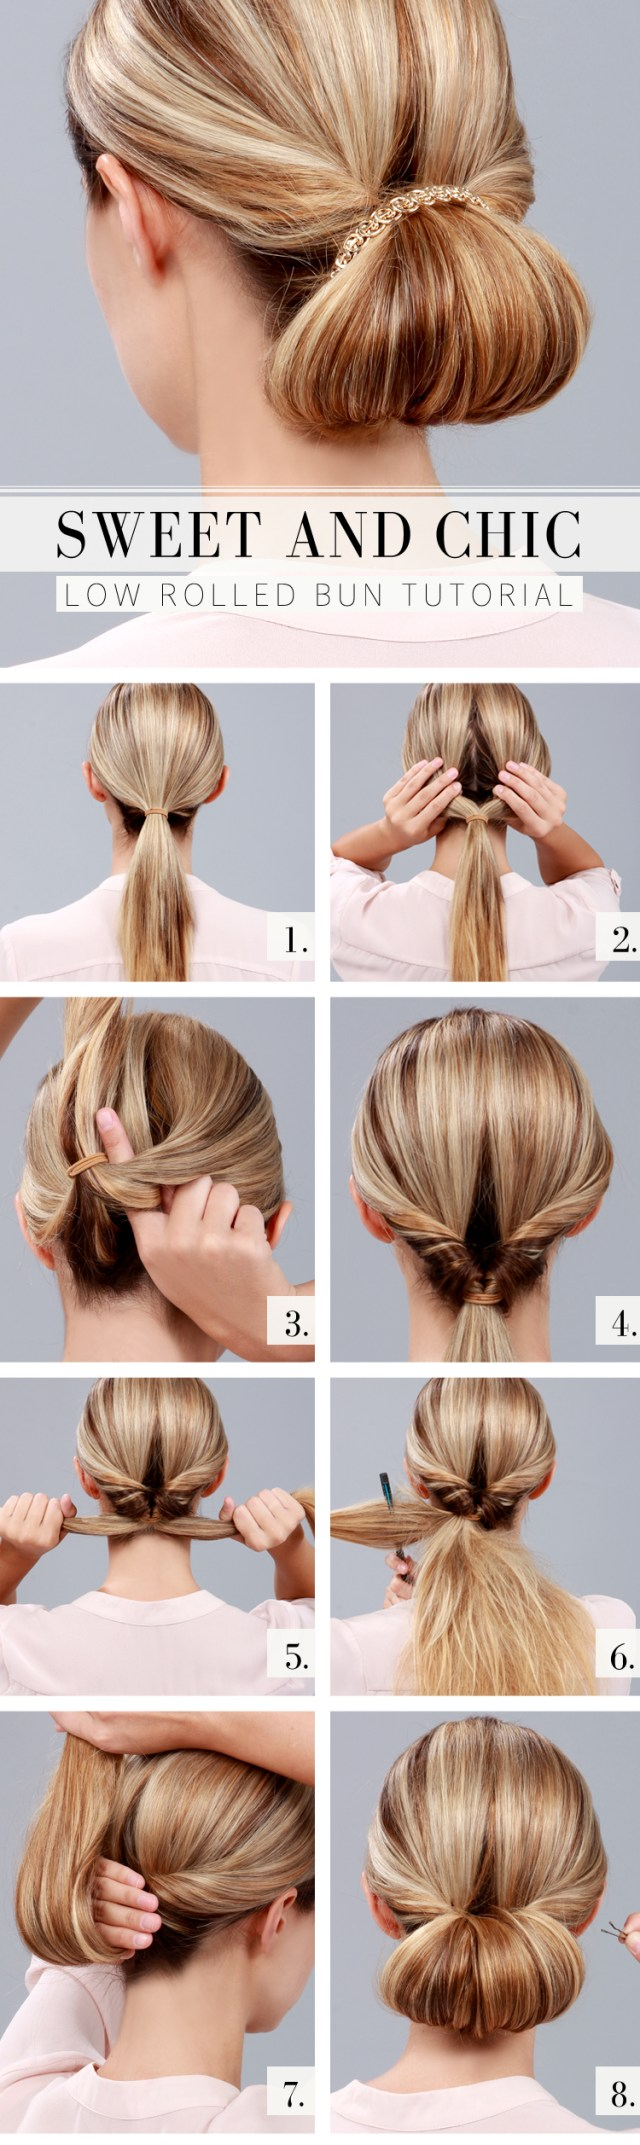 low bun hair tutorials and celebrity looks - fashionsy